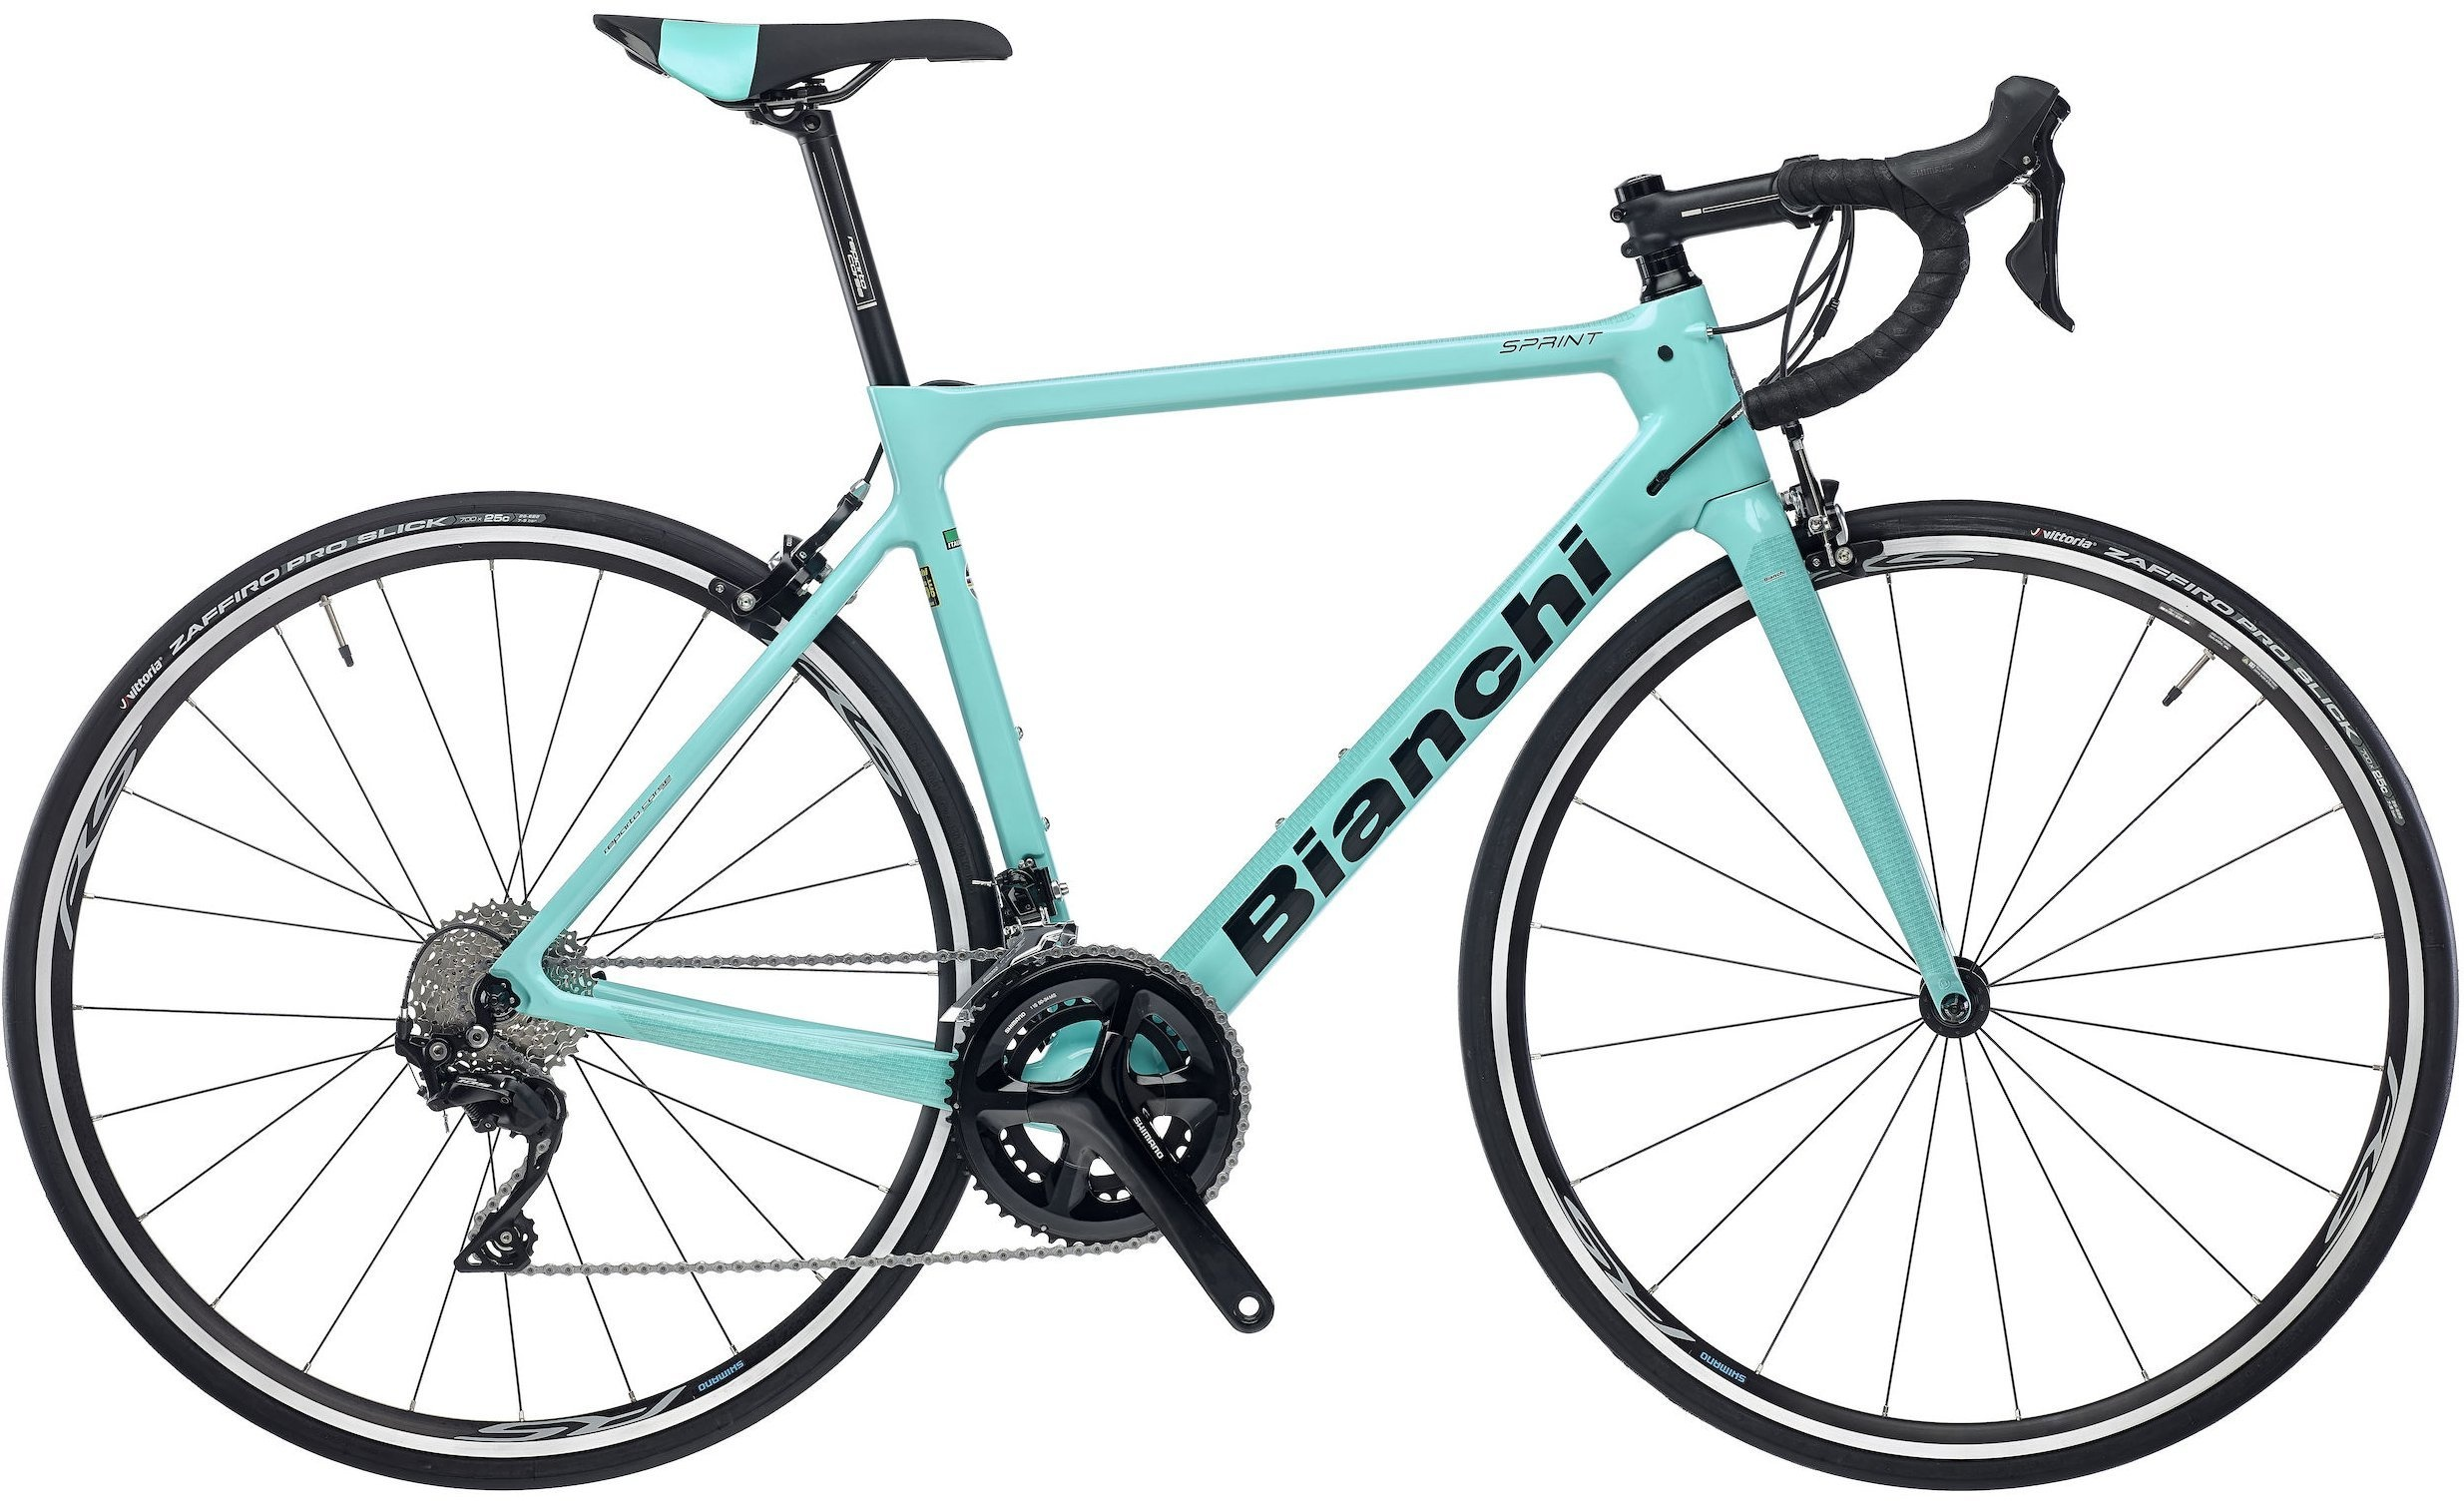 Bianchi Sprint 105 22g 2020